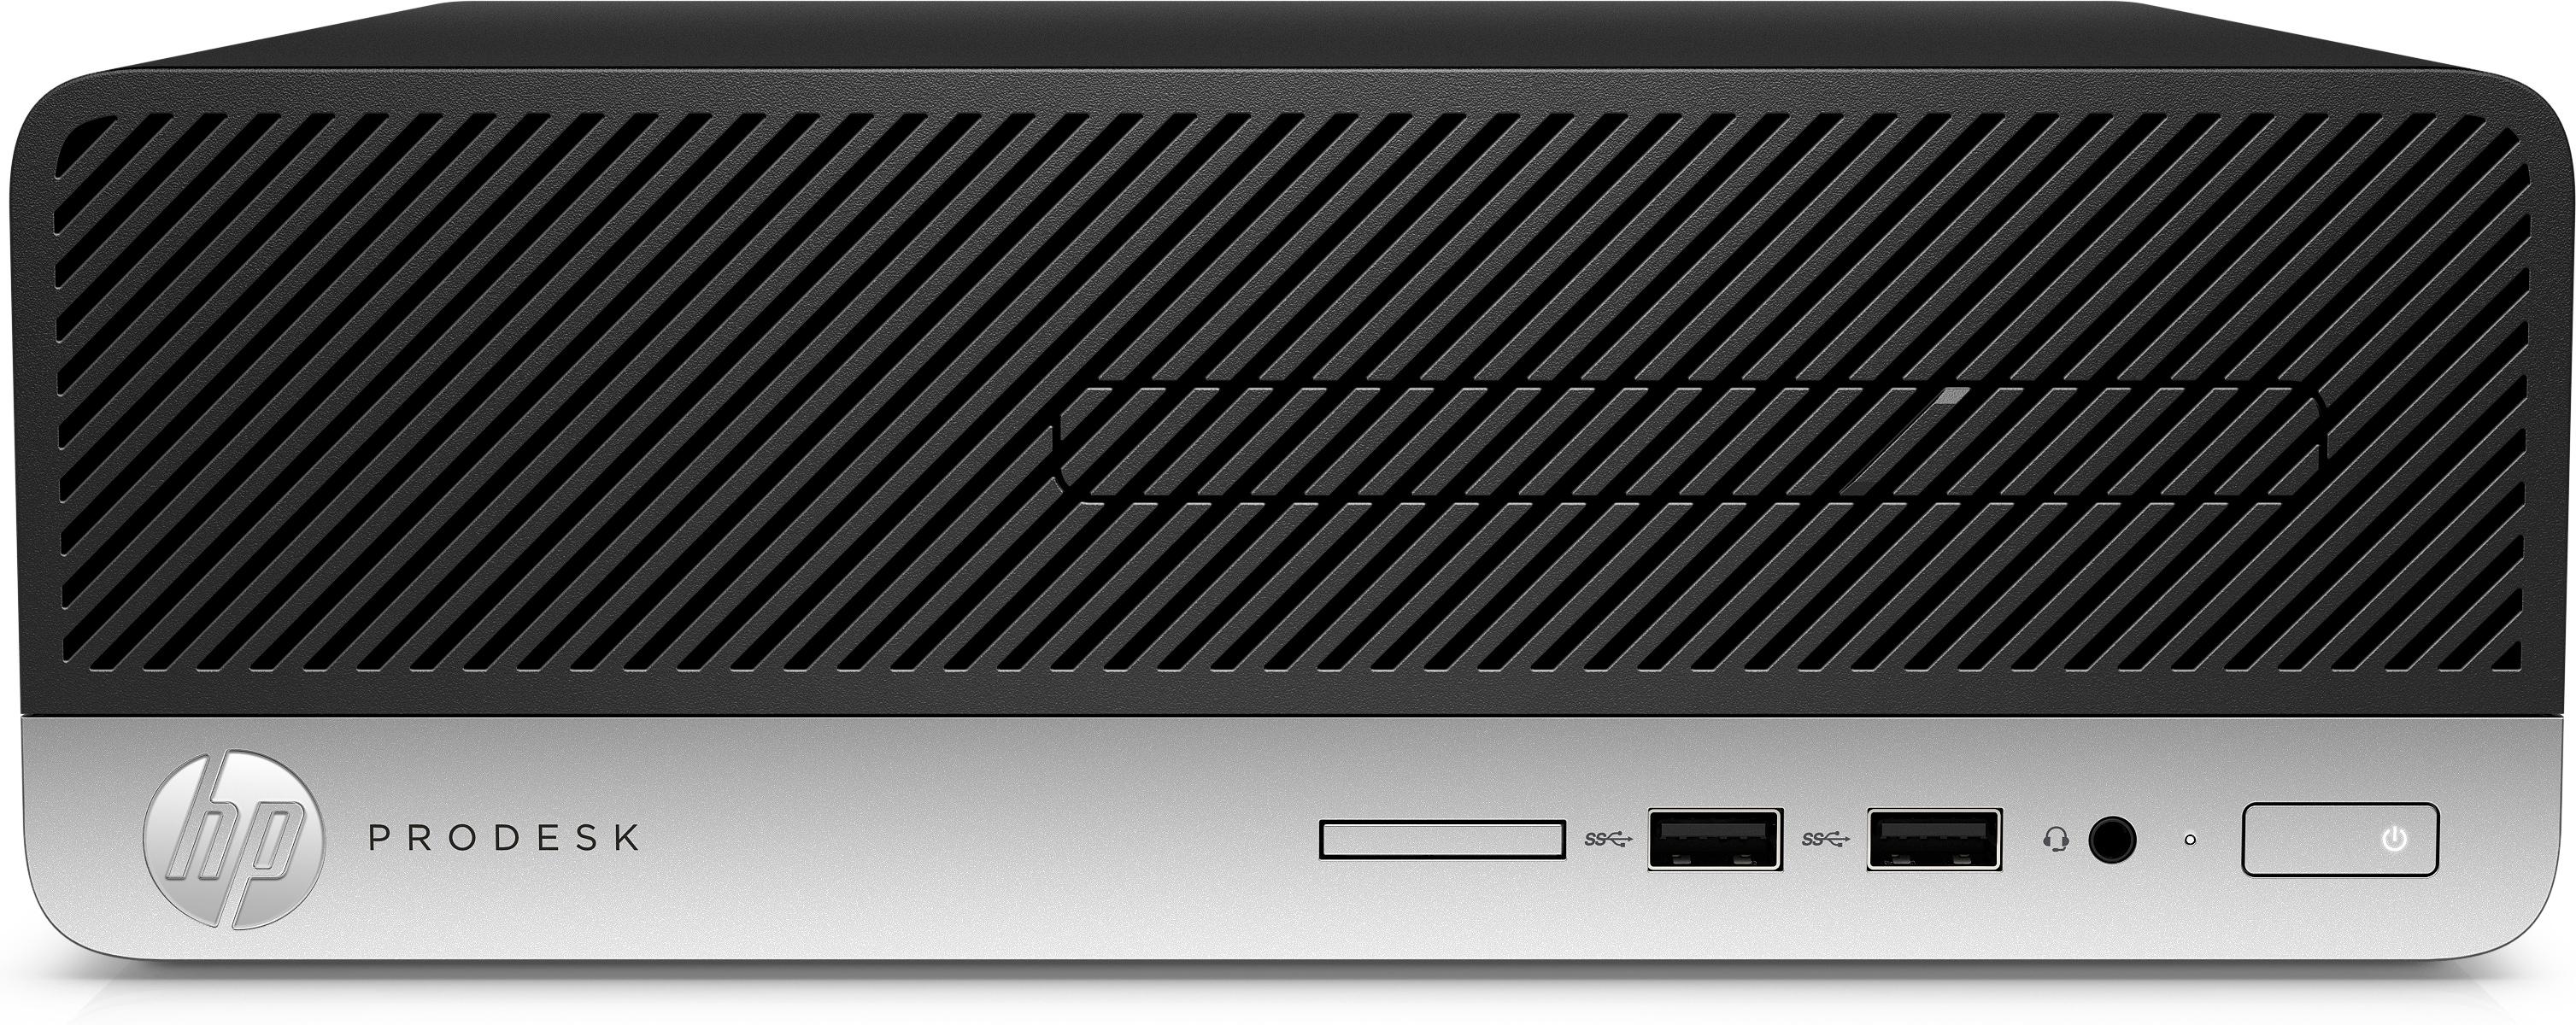 HP ProDesk 400 G6 - Komplettsystem - Core i5 3 GHz - RAM: 16 GB DDR4, GDDR5 - HDD: 512 GB NVMe - UHD Graphics 600